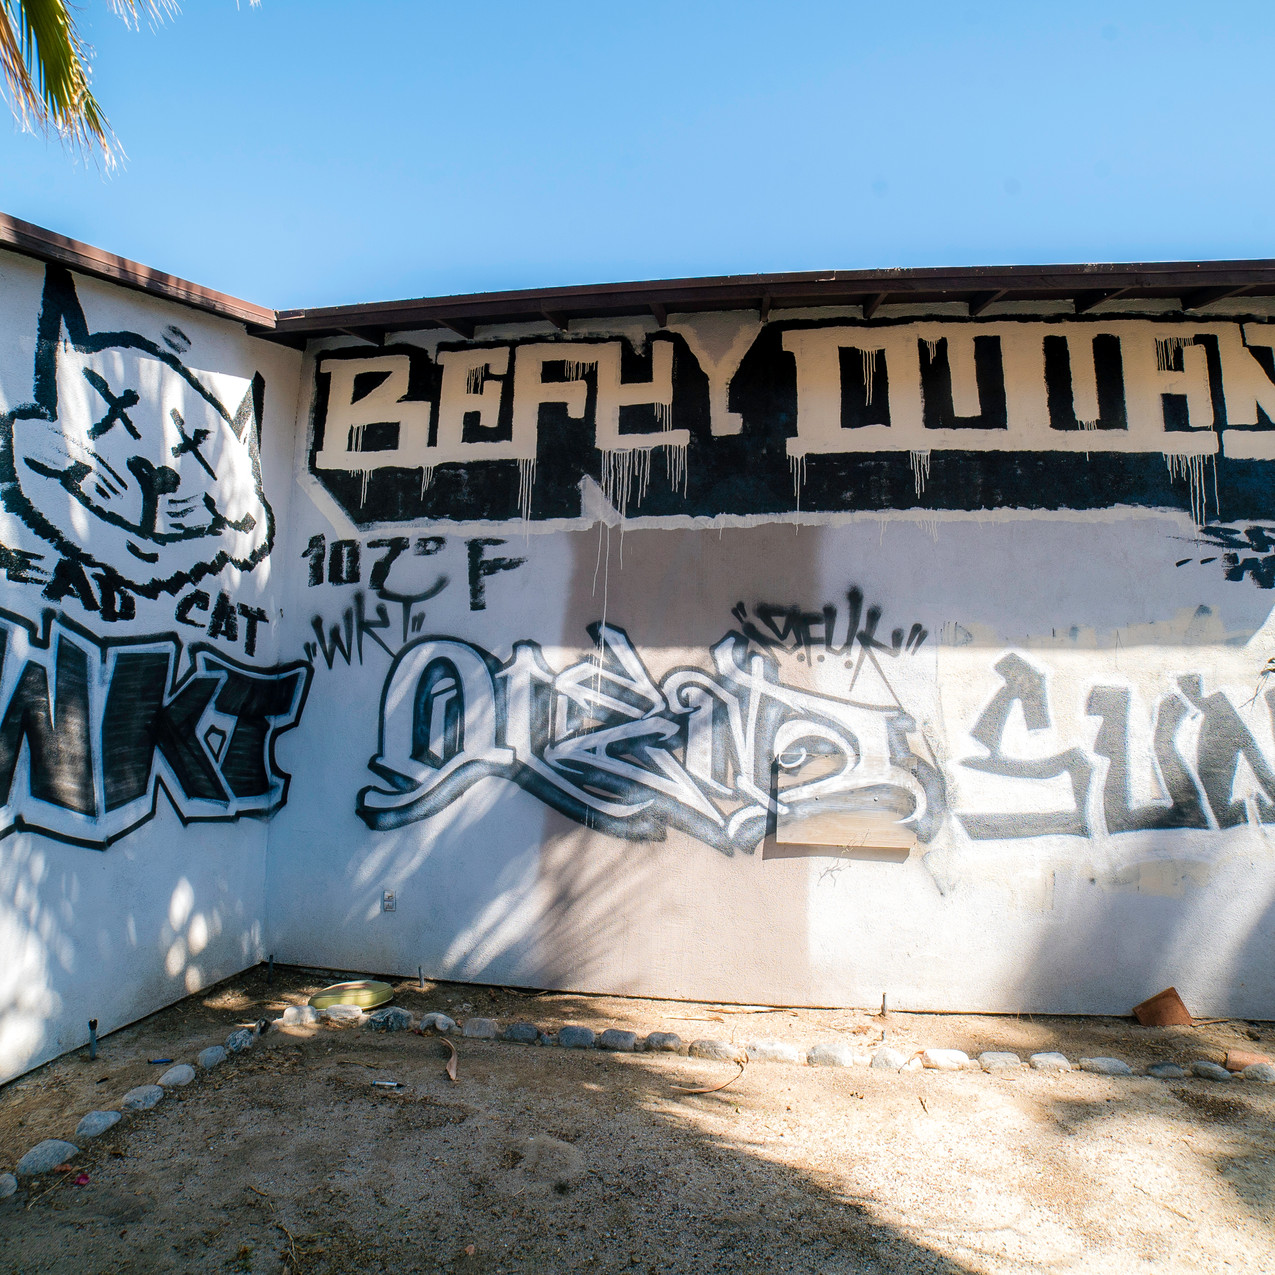 2017-09-27 Abandoned Orchard Tree Inn RAW-8